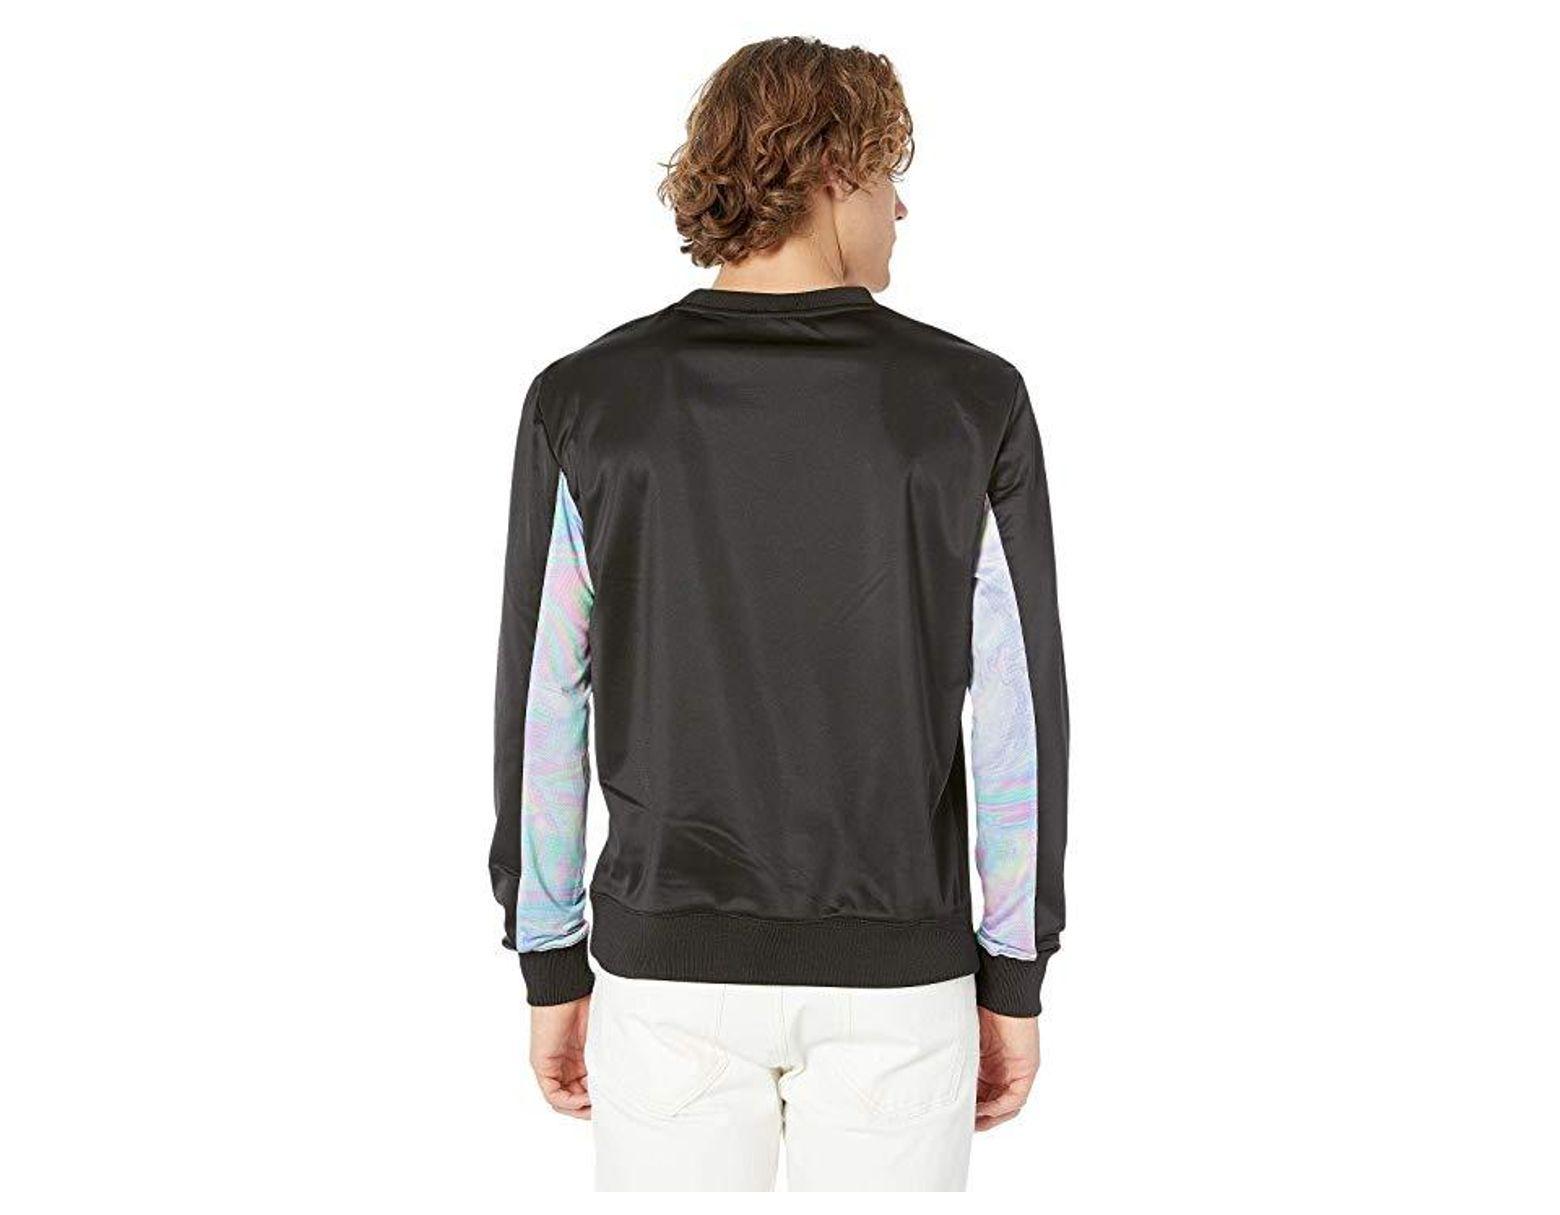 ed6ff0e0 Fila Walter Crew (black/pastel Lilac) T Shirt in Black for Men - Save 33% -  Lyst